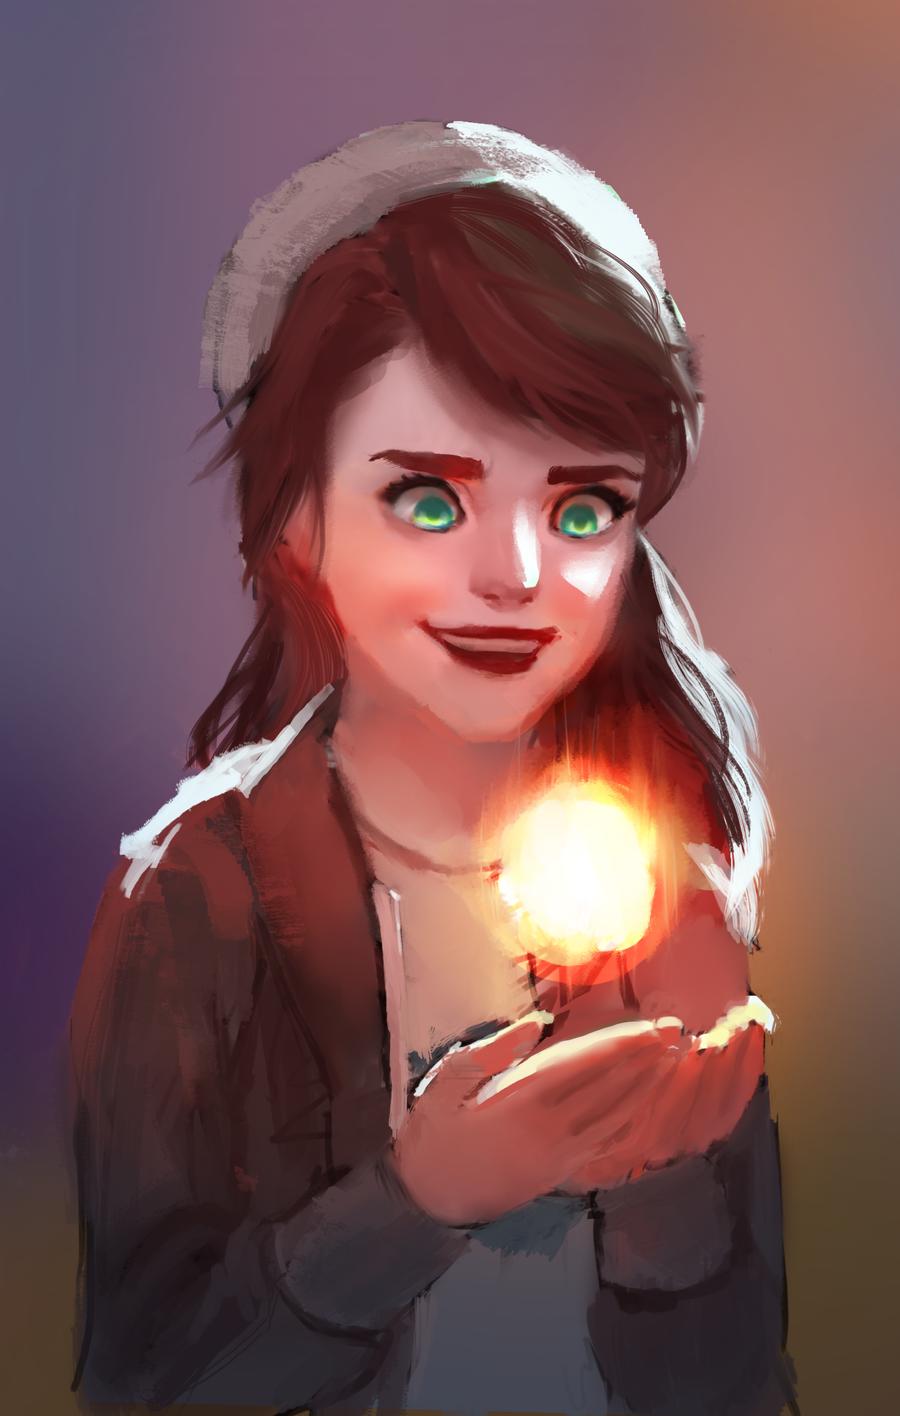 Firelight by Zalogon